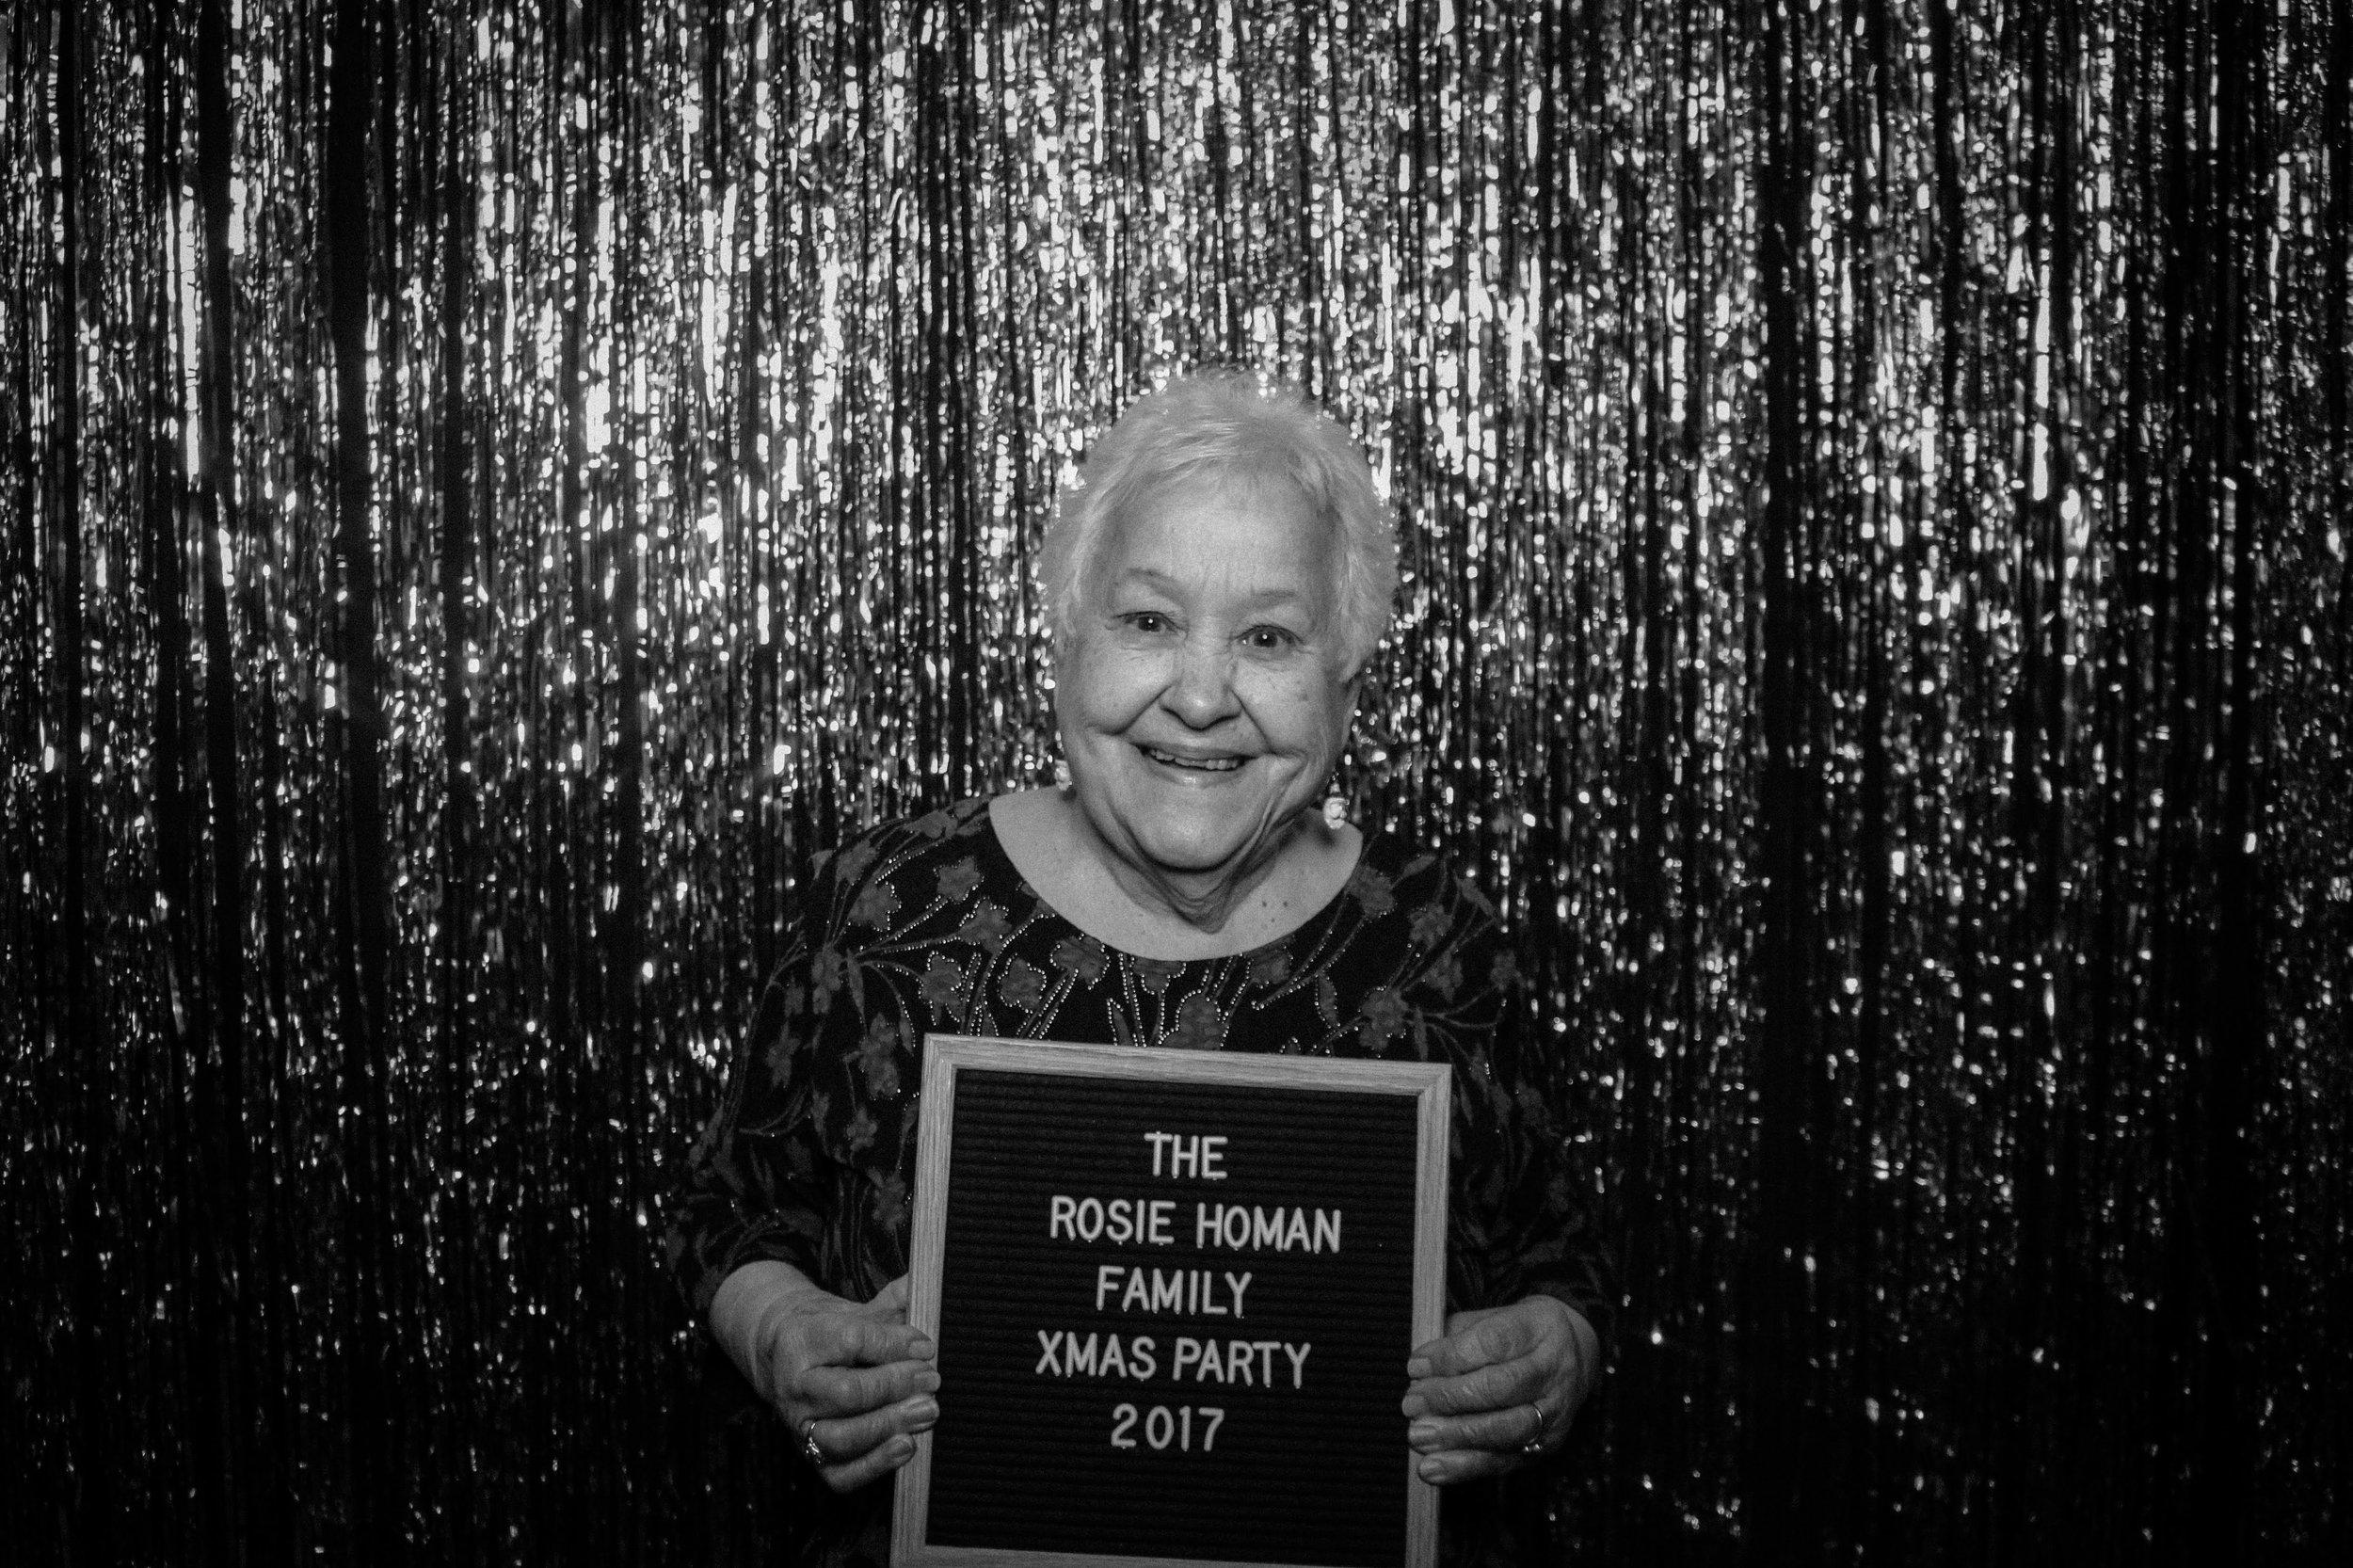 Rosie Homan Xmas Party 2017-052.jpg